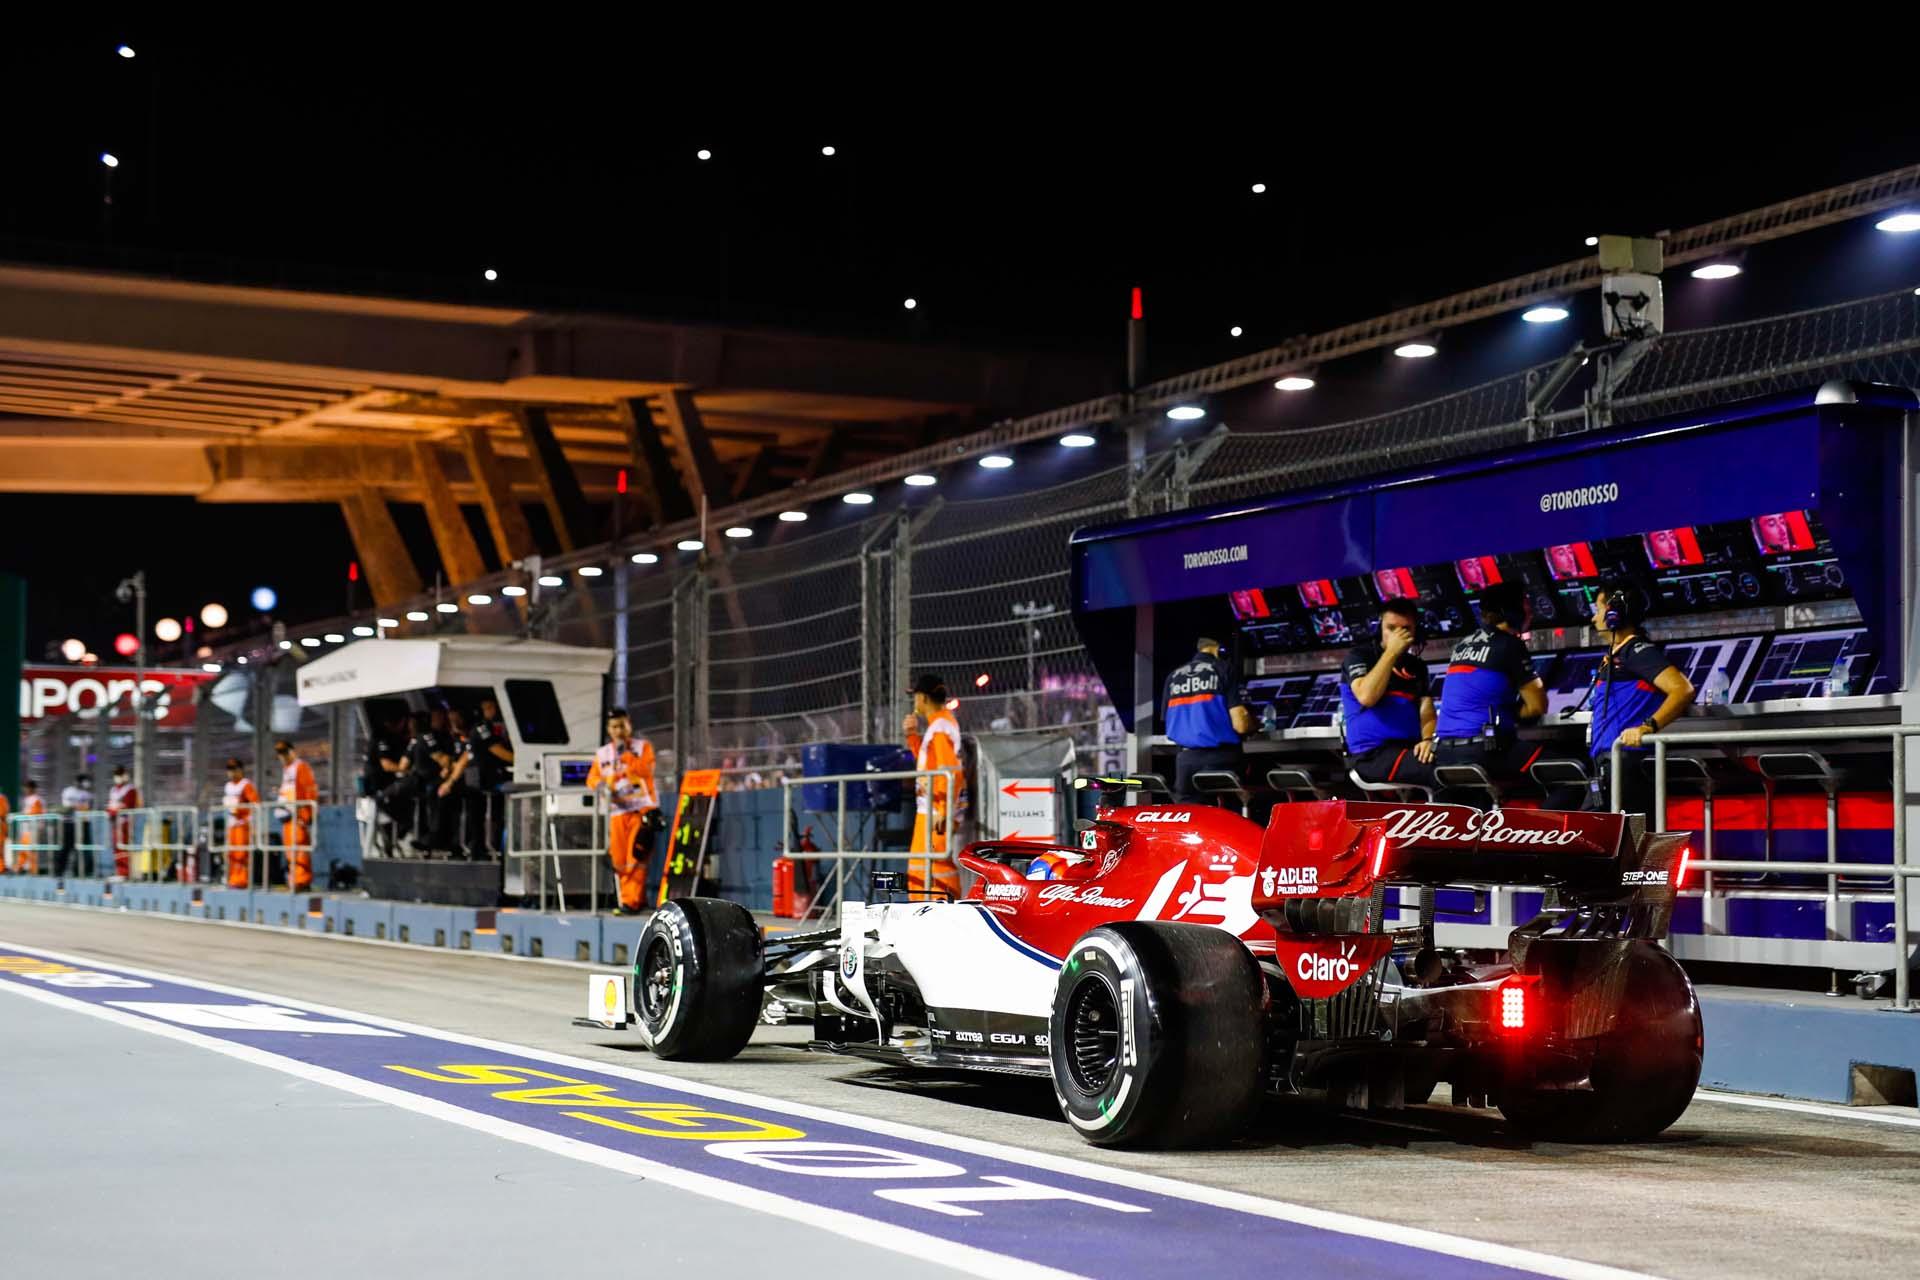 F1 - SINGAPORE GRAND PRIX 2019